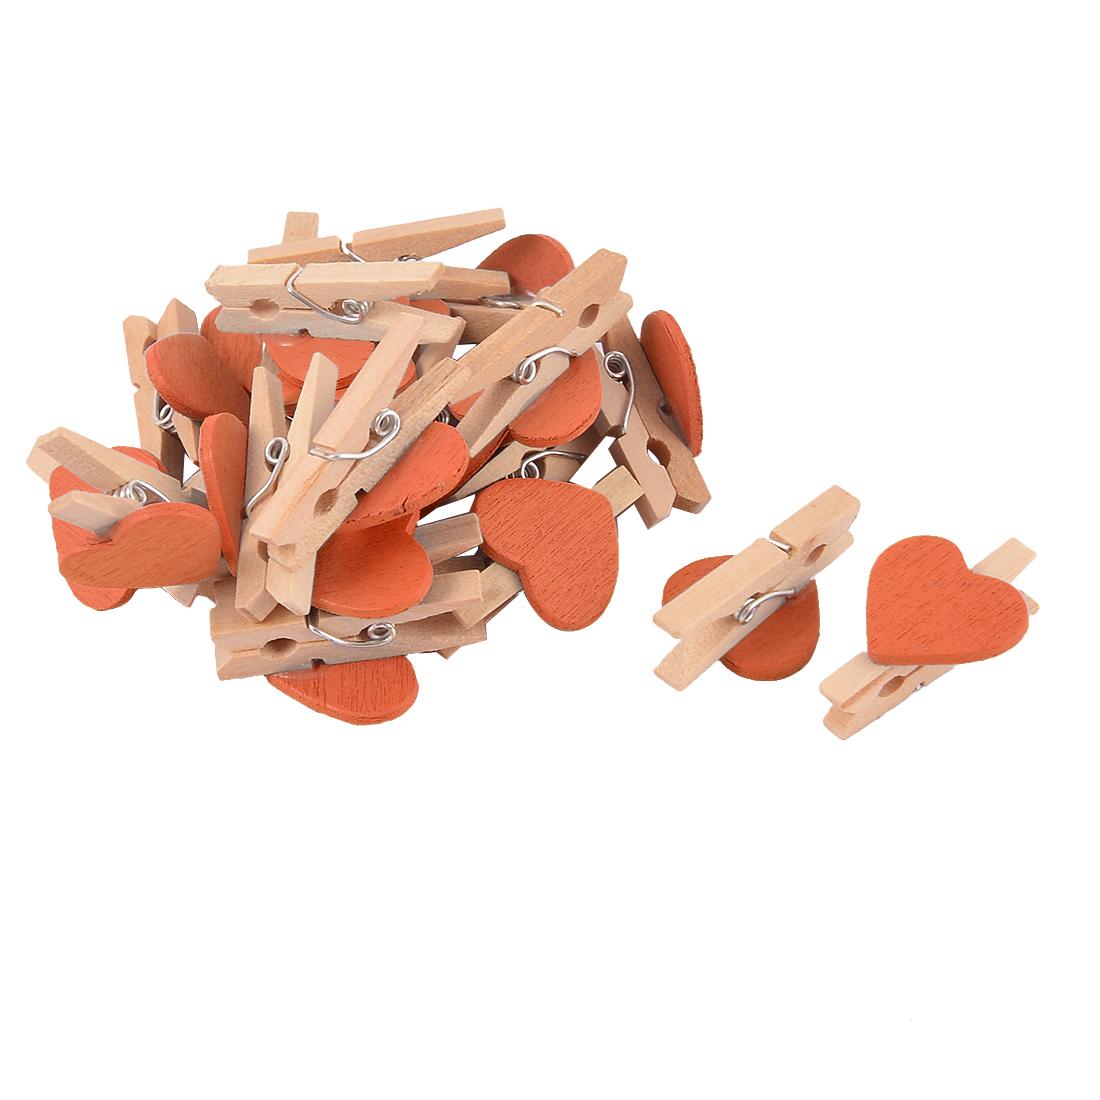 Party Card Photo Decoration Love Heart Mini Wooden Clip Pegs Orange 20pcs